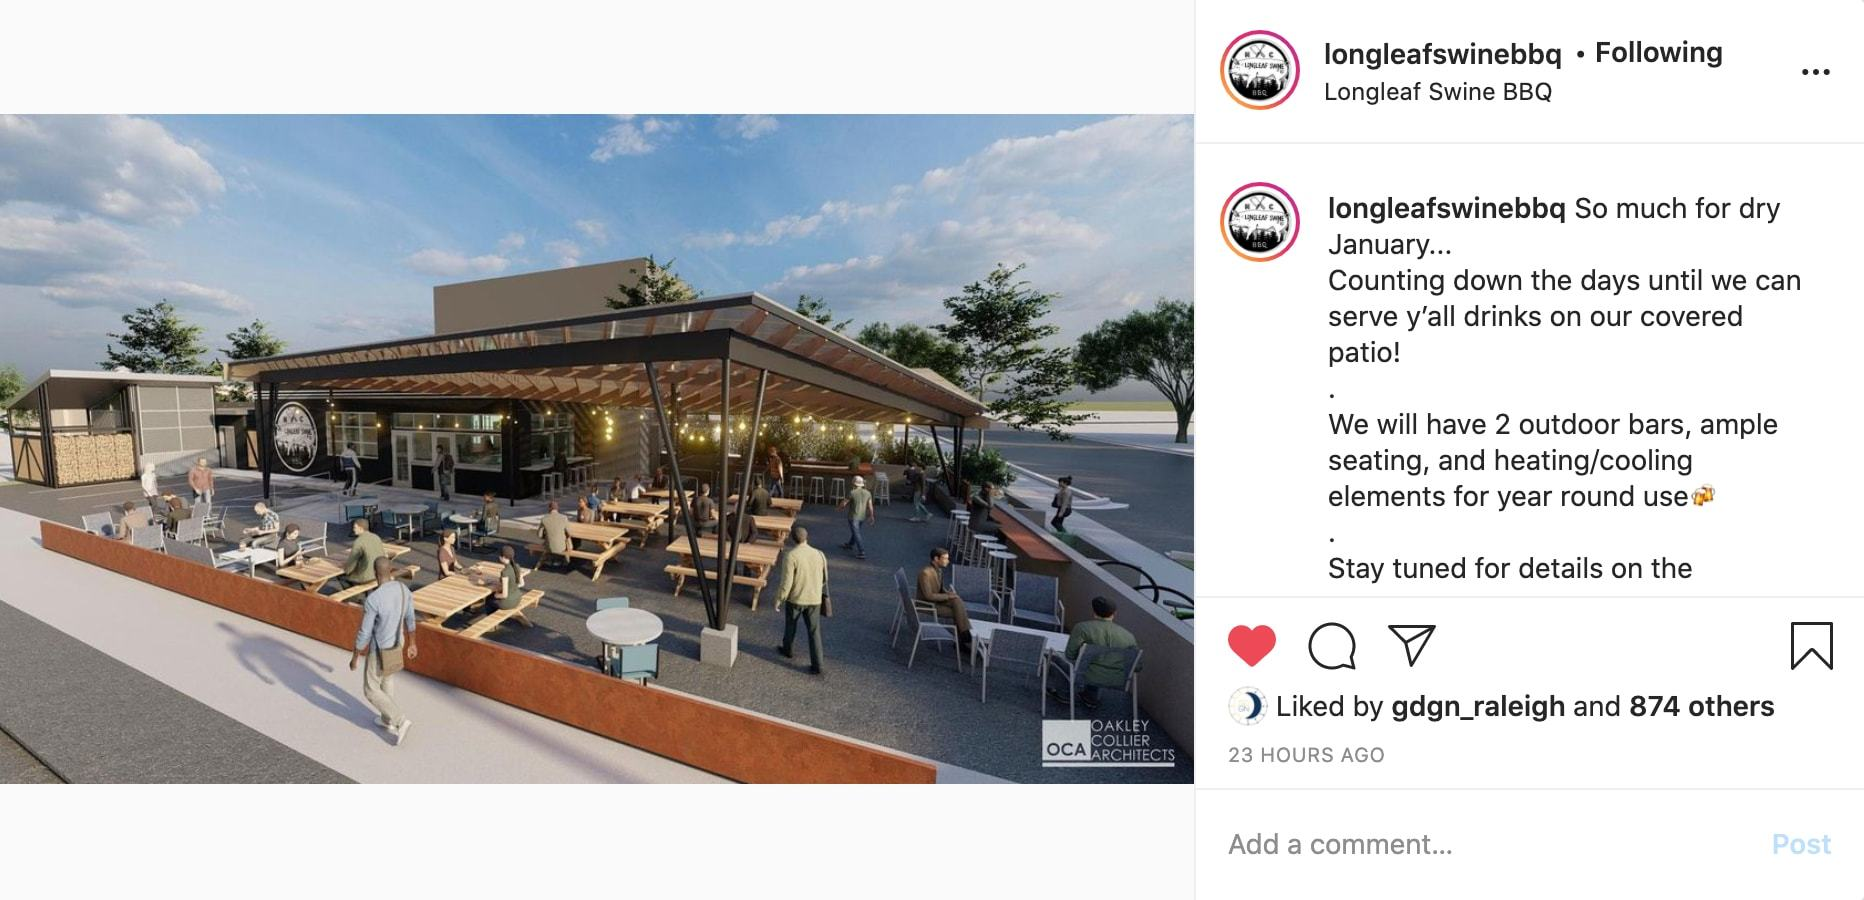 Longleaf Swine BBQ rendering